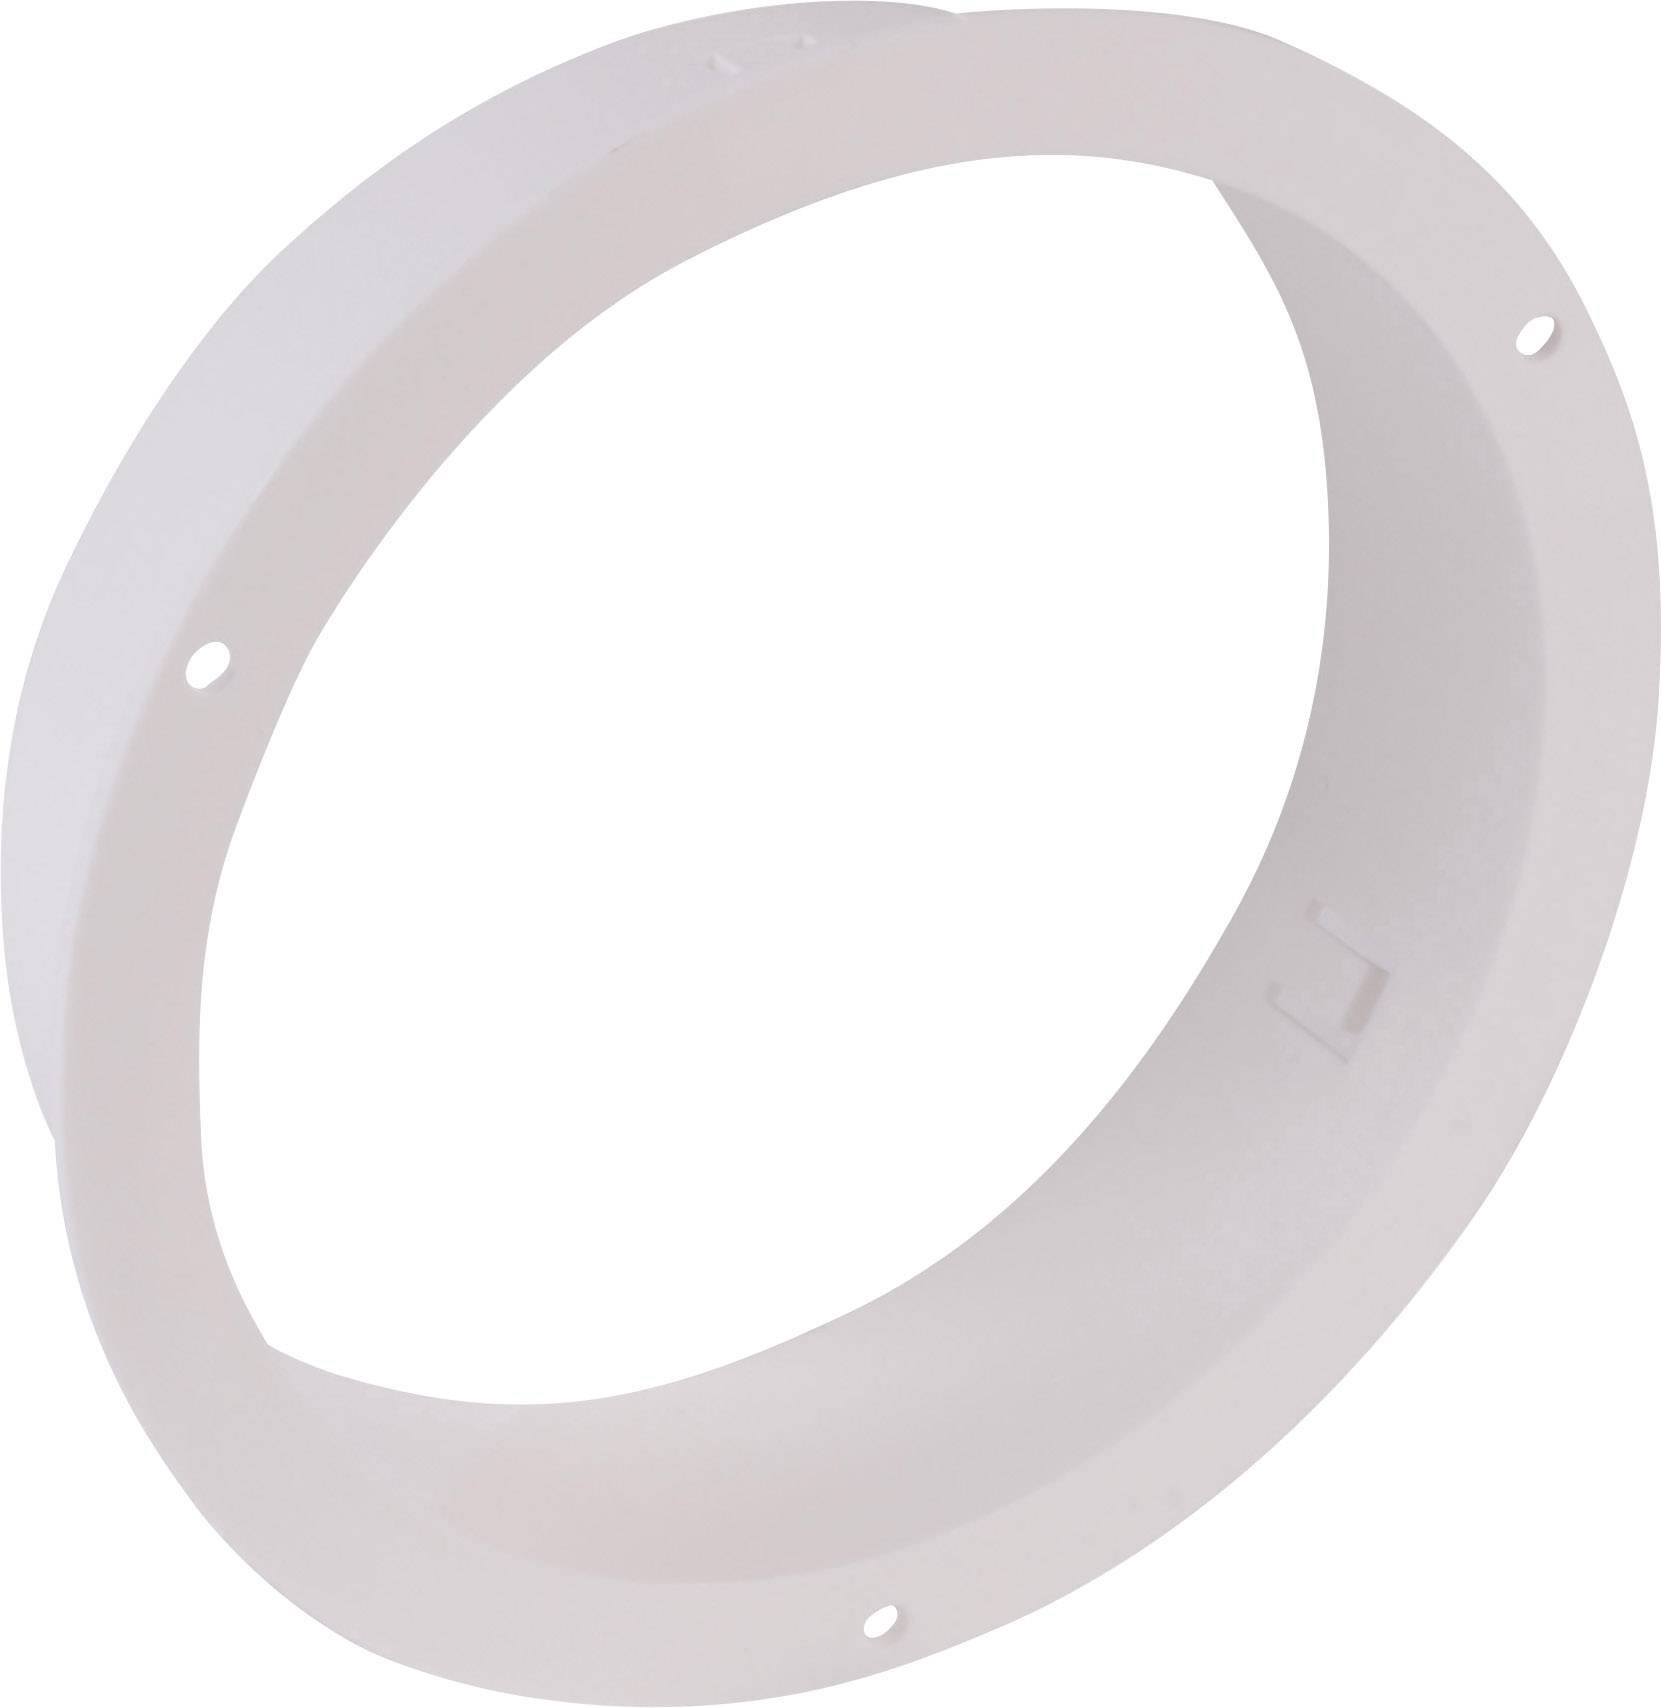 Pripojovacie hrdlo Wallair 100 mm, biele